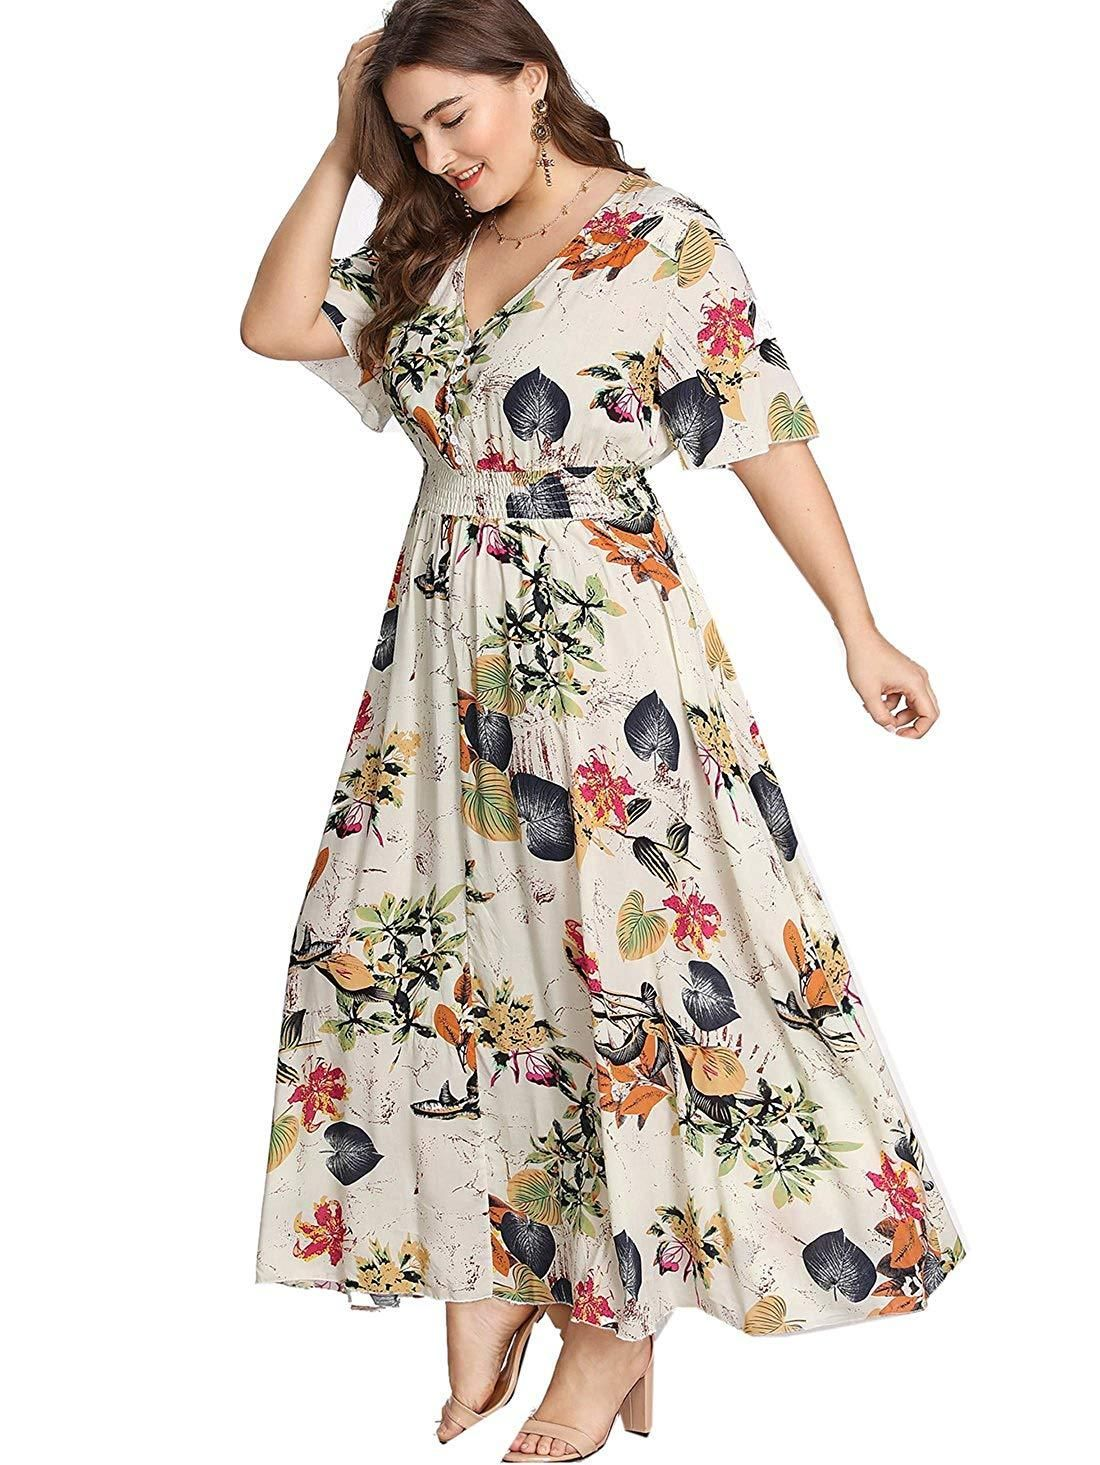 Romwe Women\'s Plus Size Floral Print Buttons Short Sleeve V ...